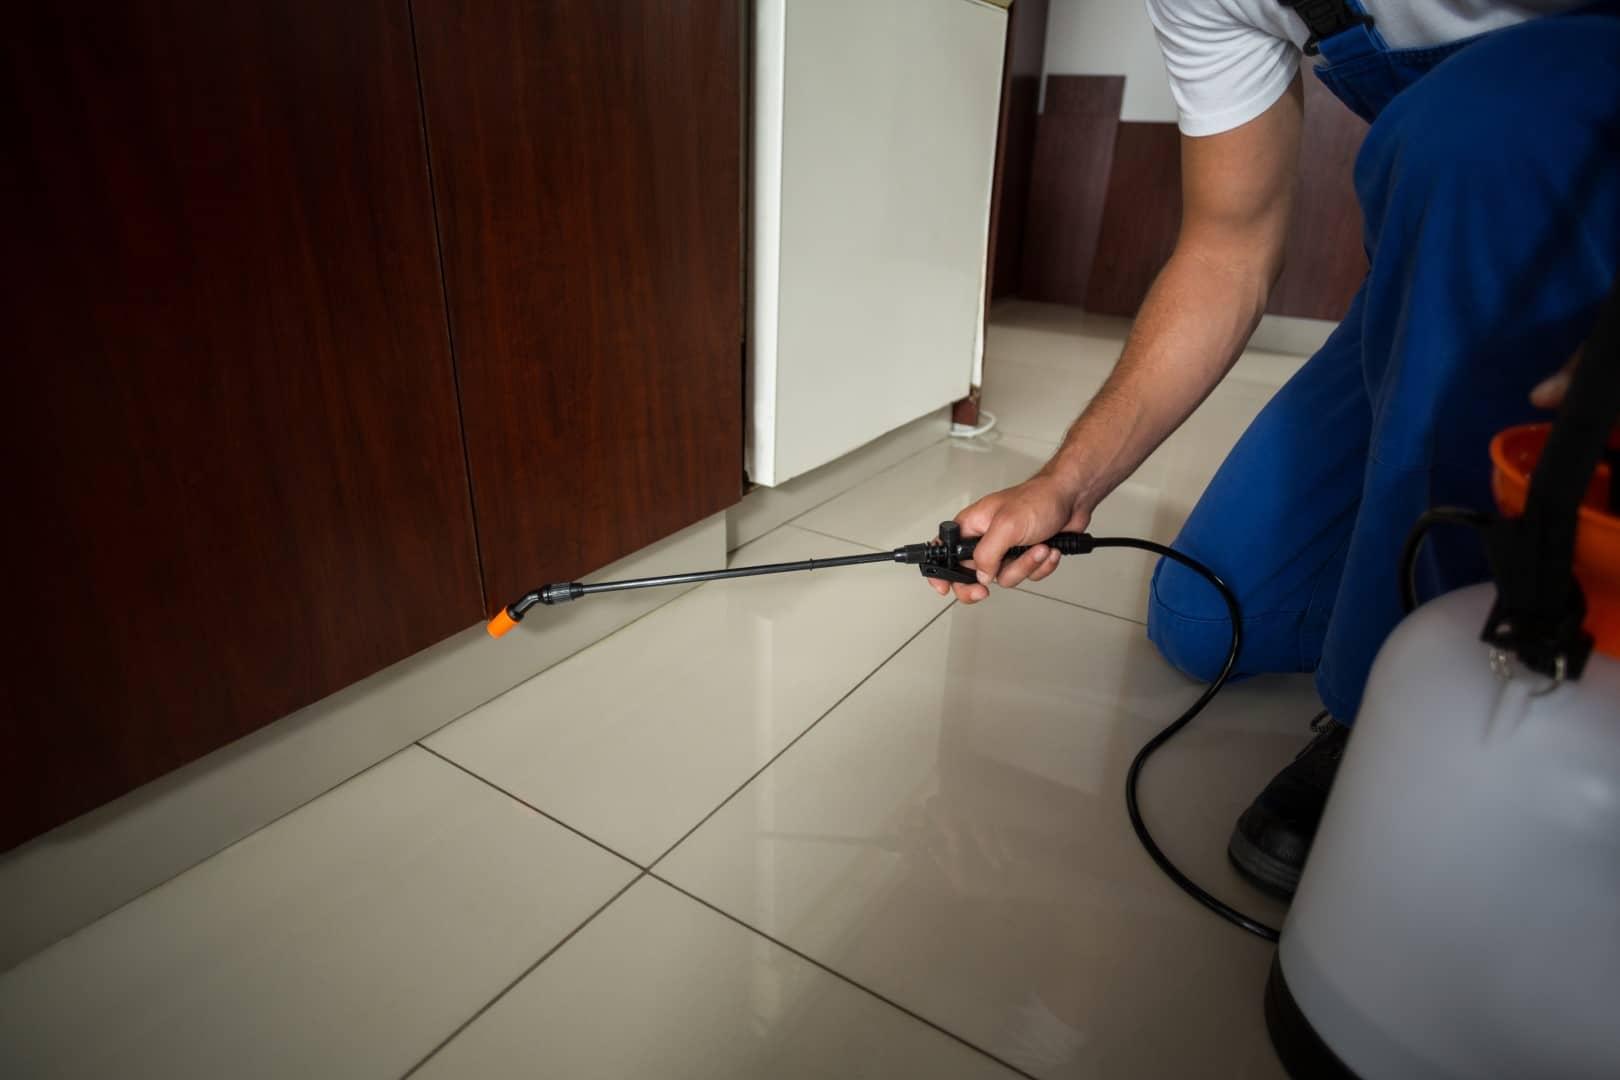 Curtail Pest Infestation Through Professional Pest Control Service